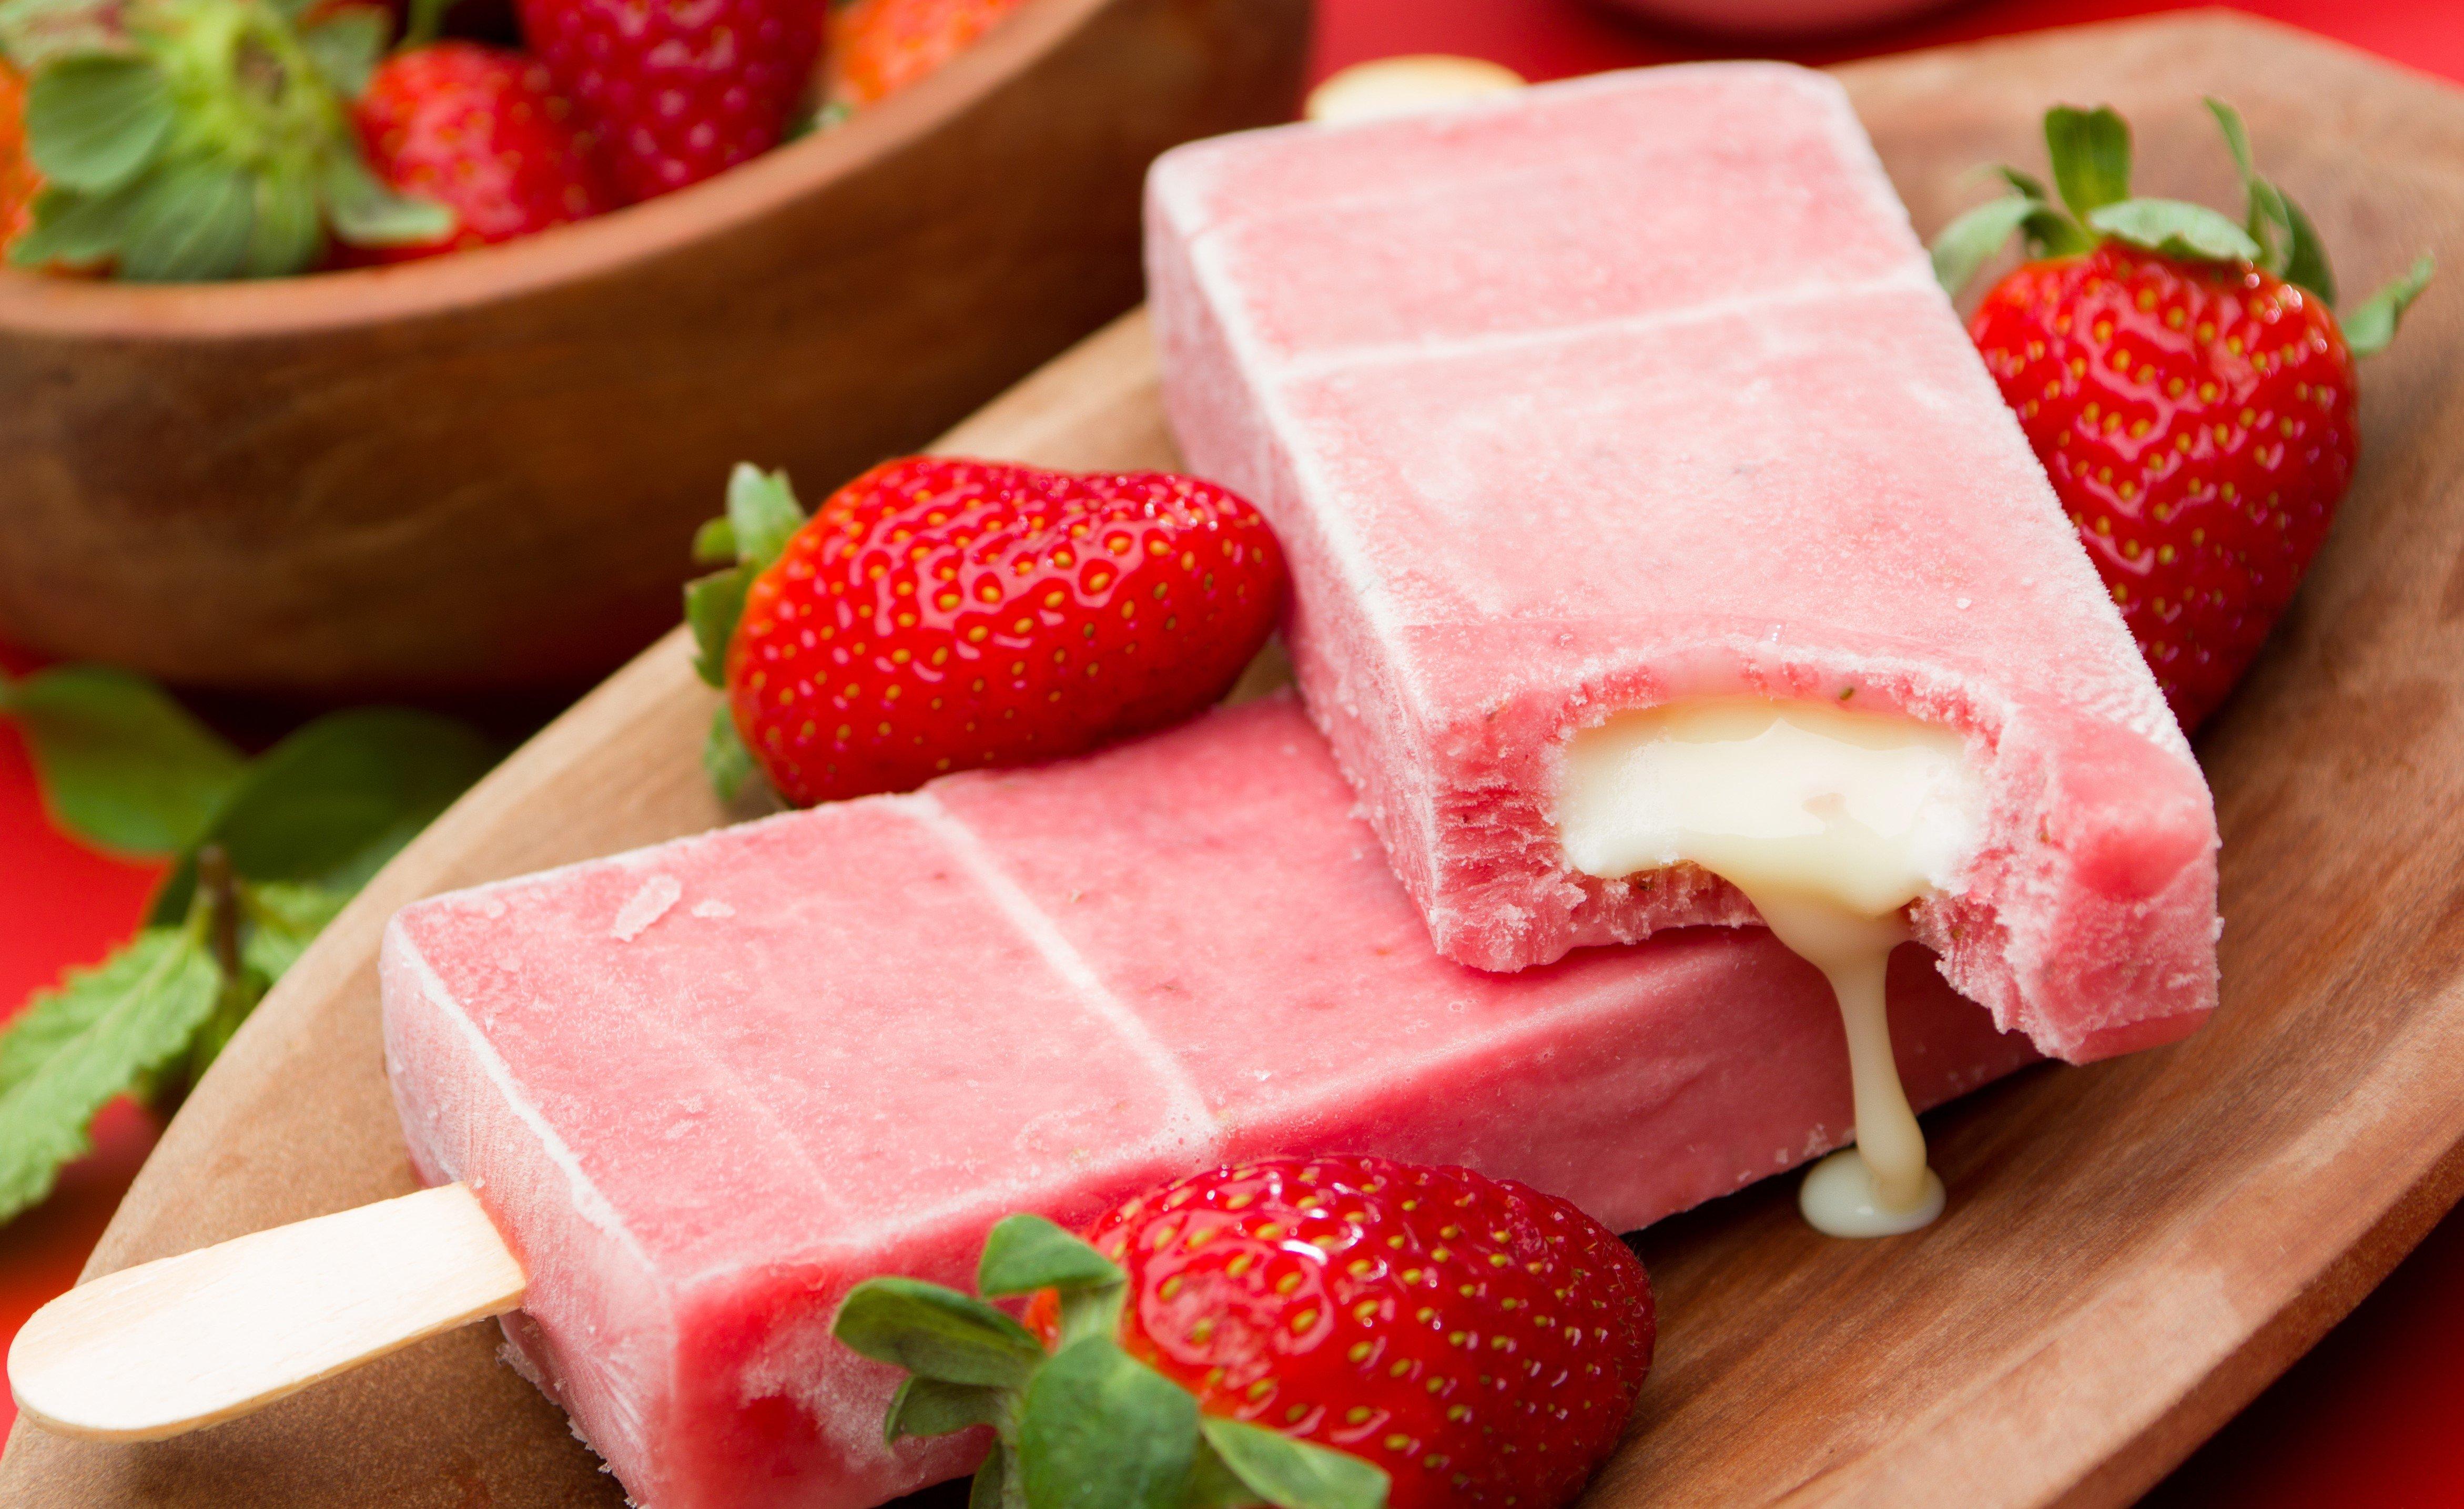 CEC Strawberry Flavour 7388-03